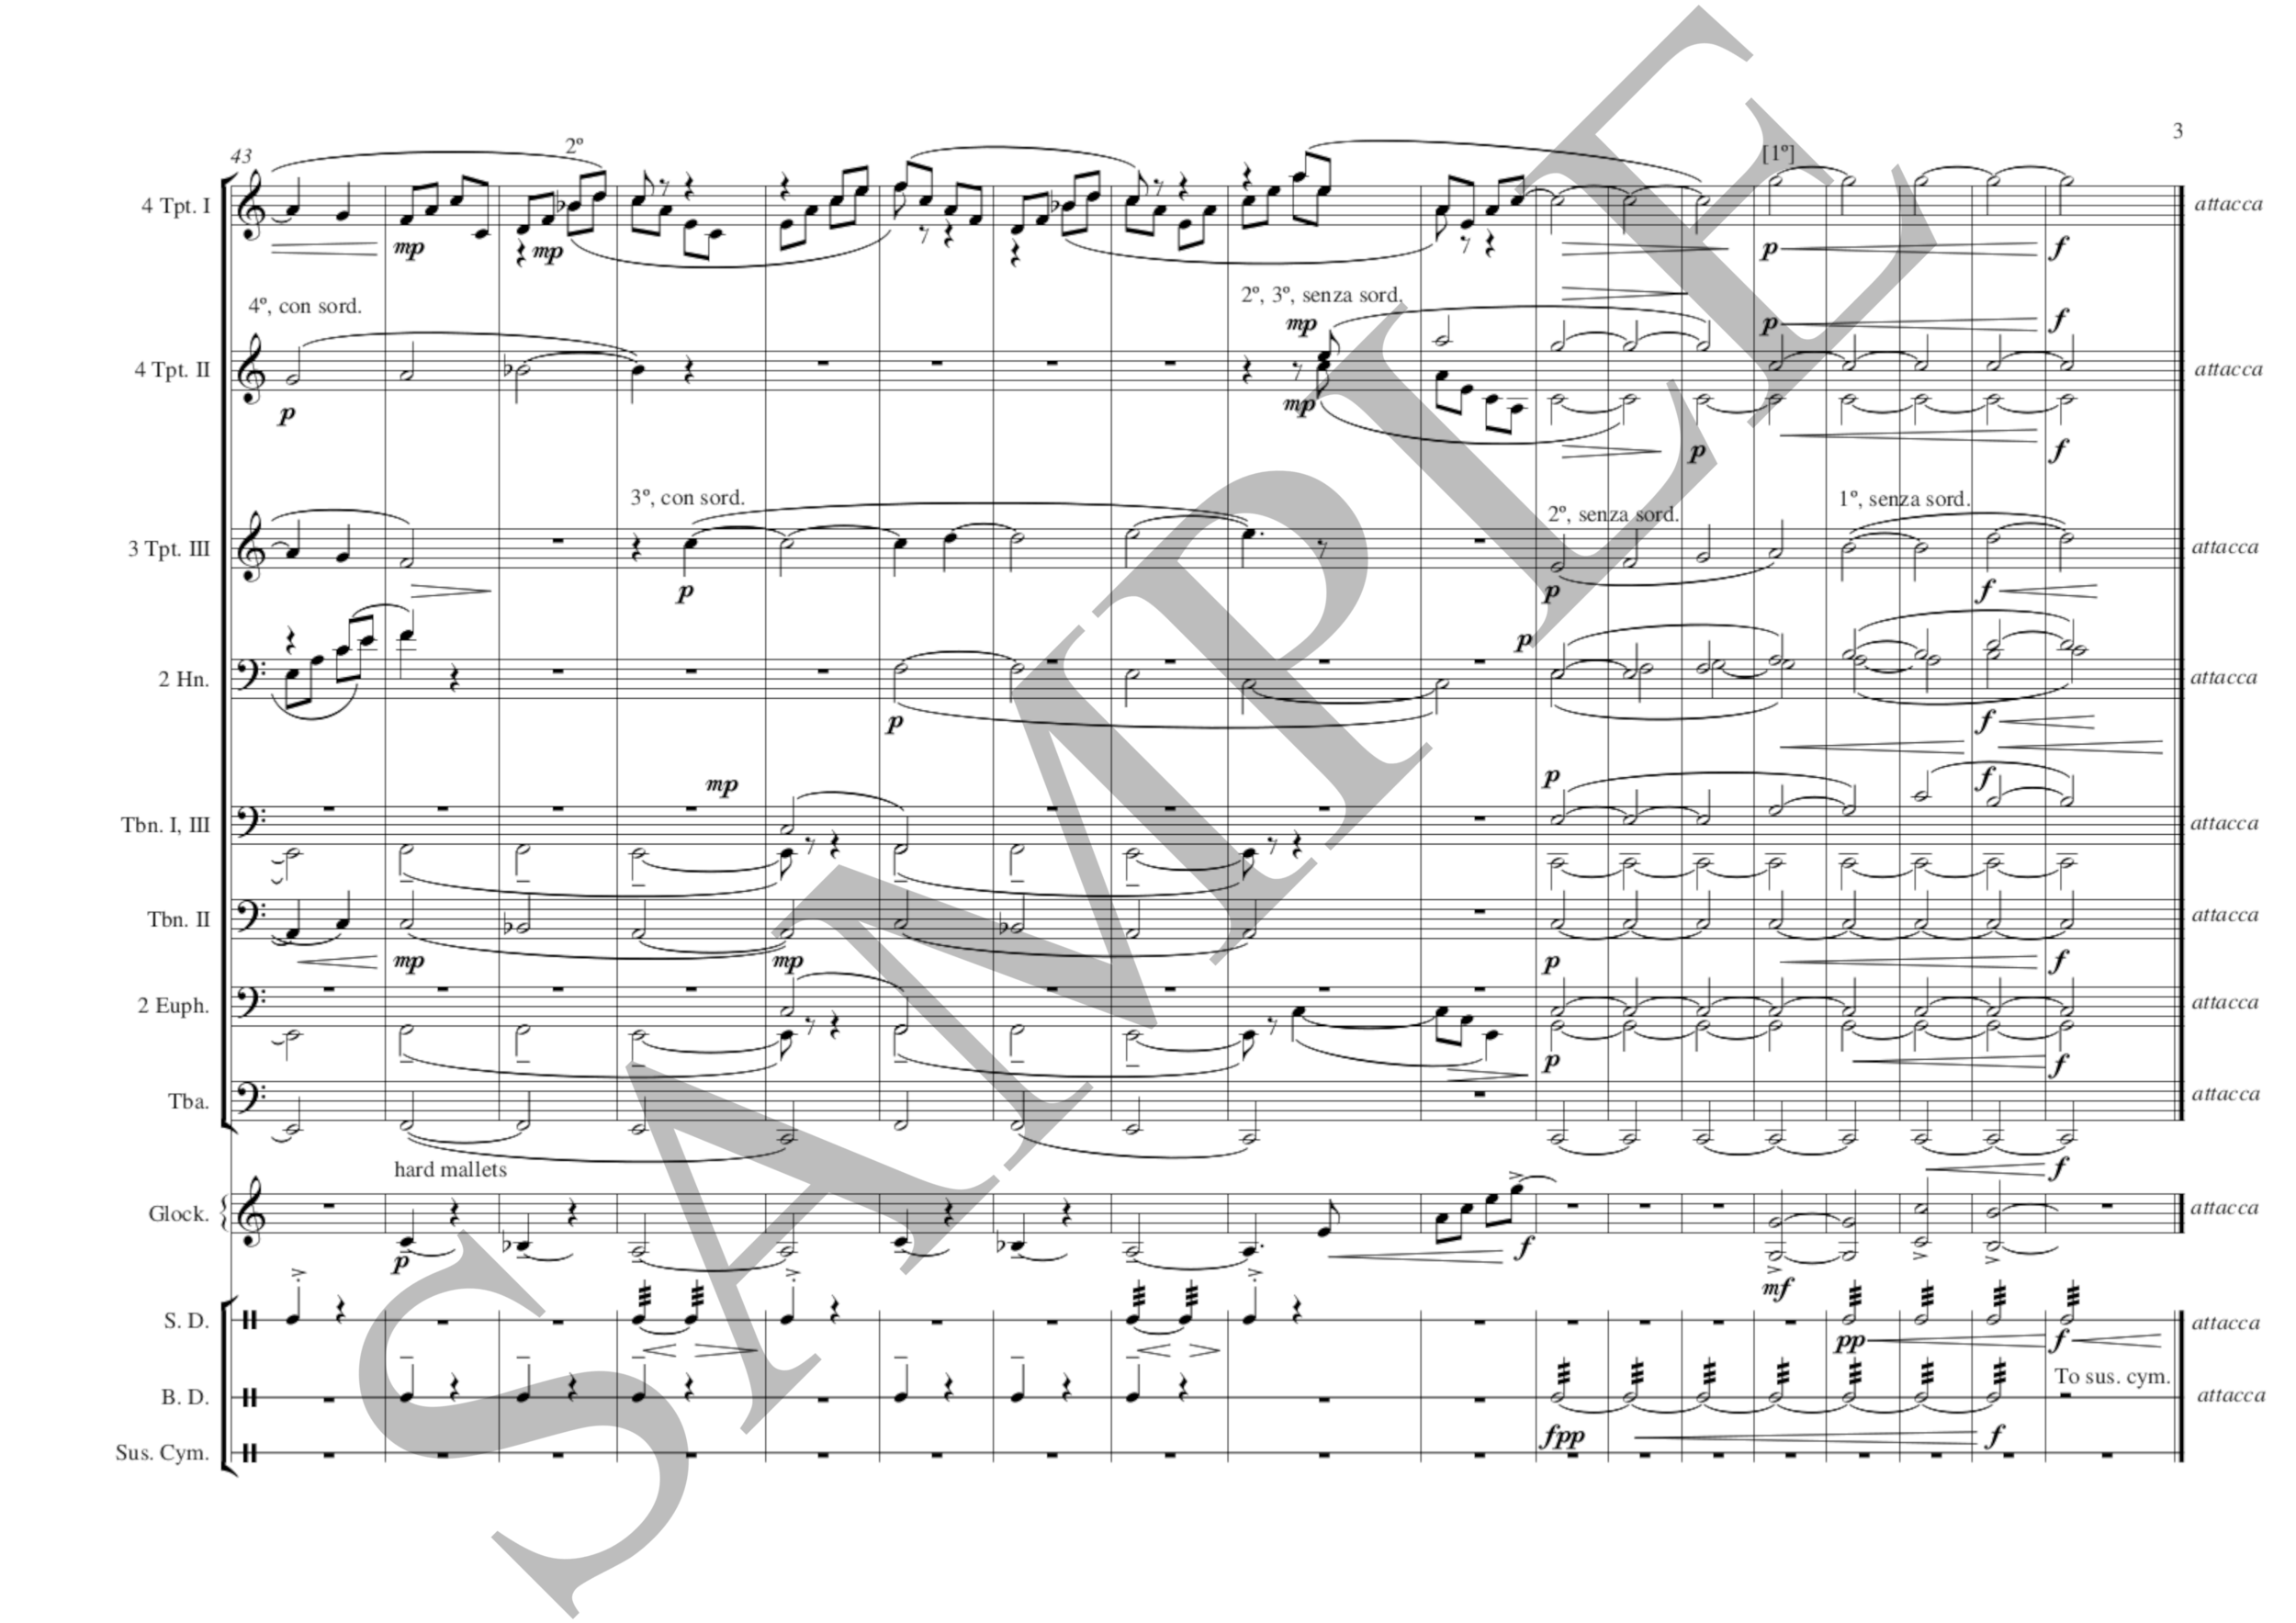 Century (brass ens) Schultz/arr. Cook SAMPLE